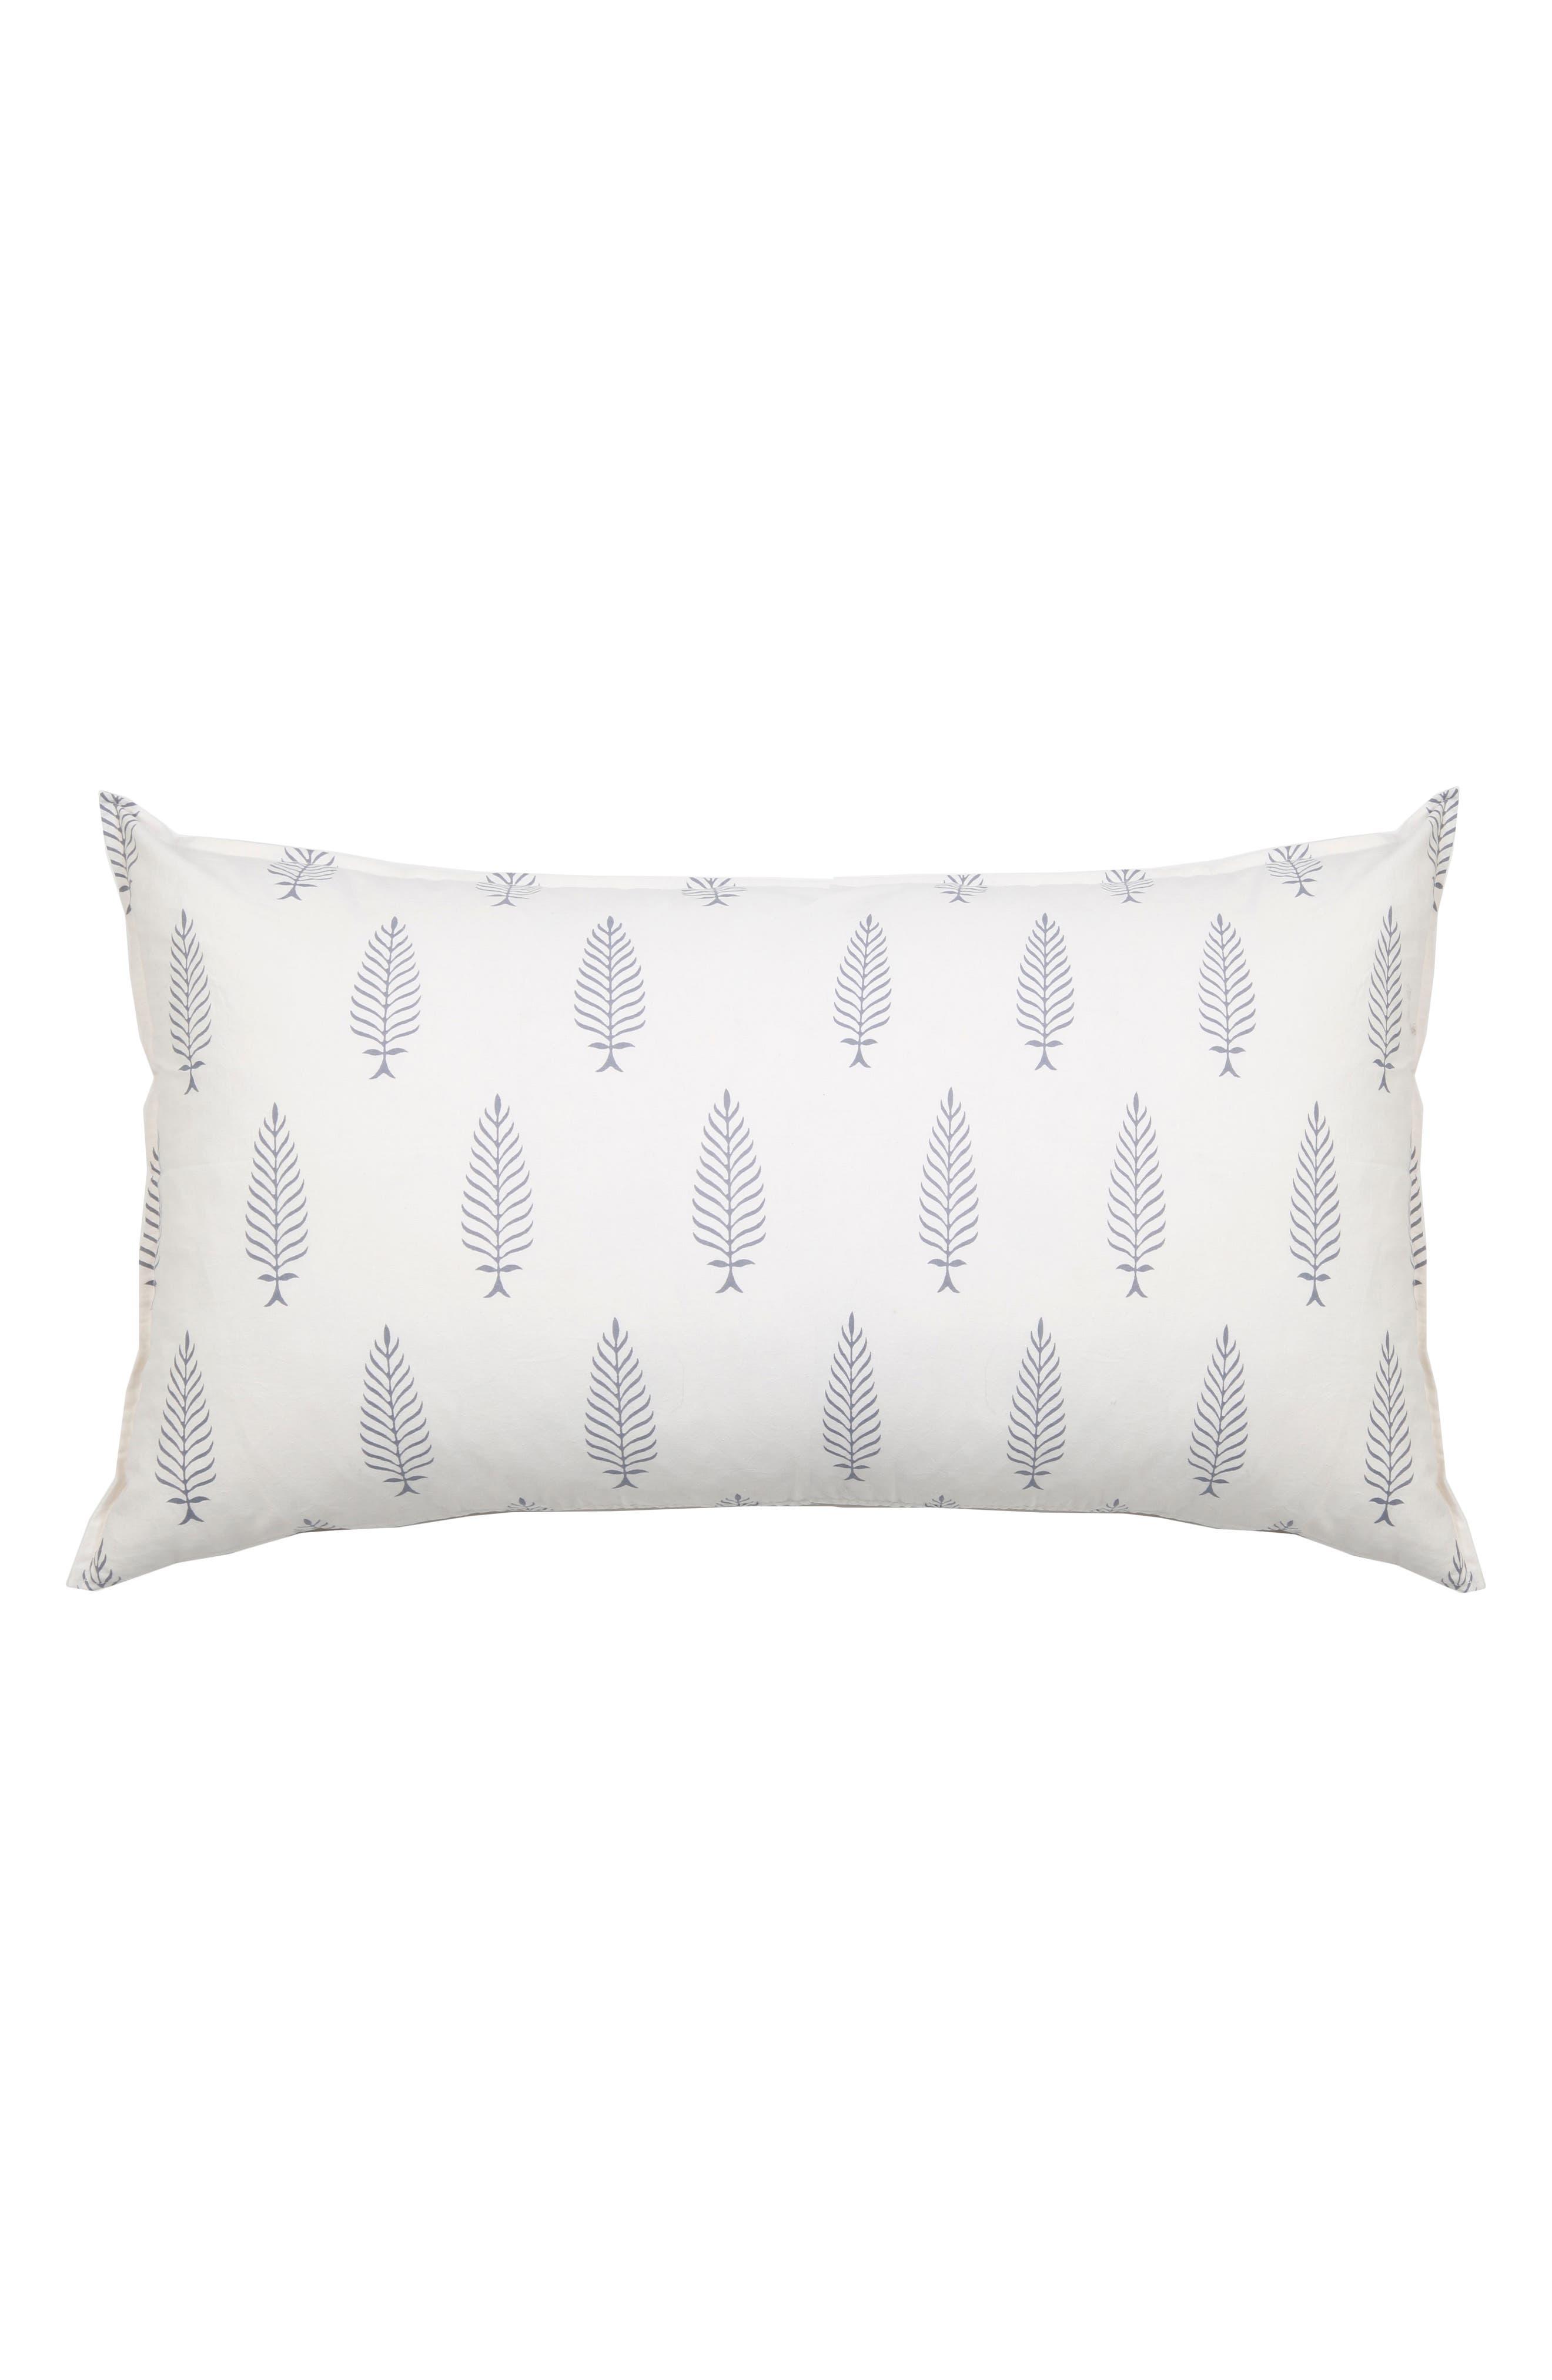 Kiara Accent Pillow,                             Main thumbnail 1, color,                             400